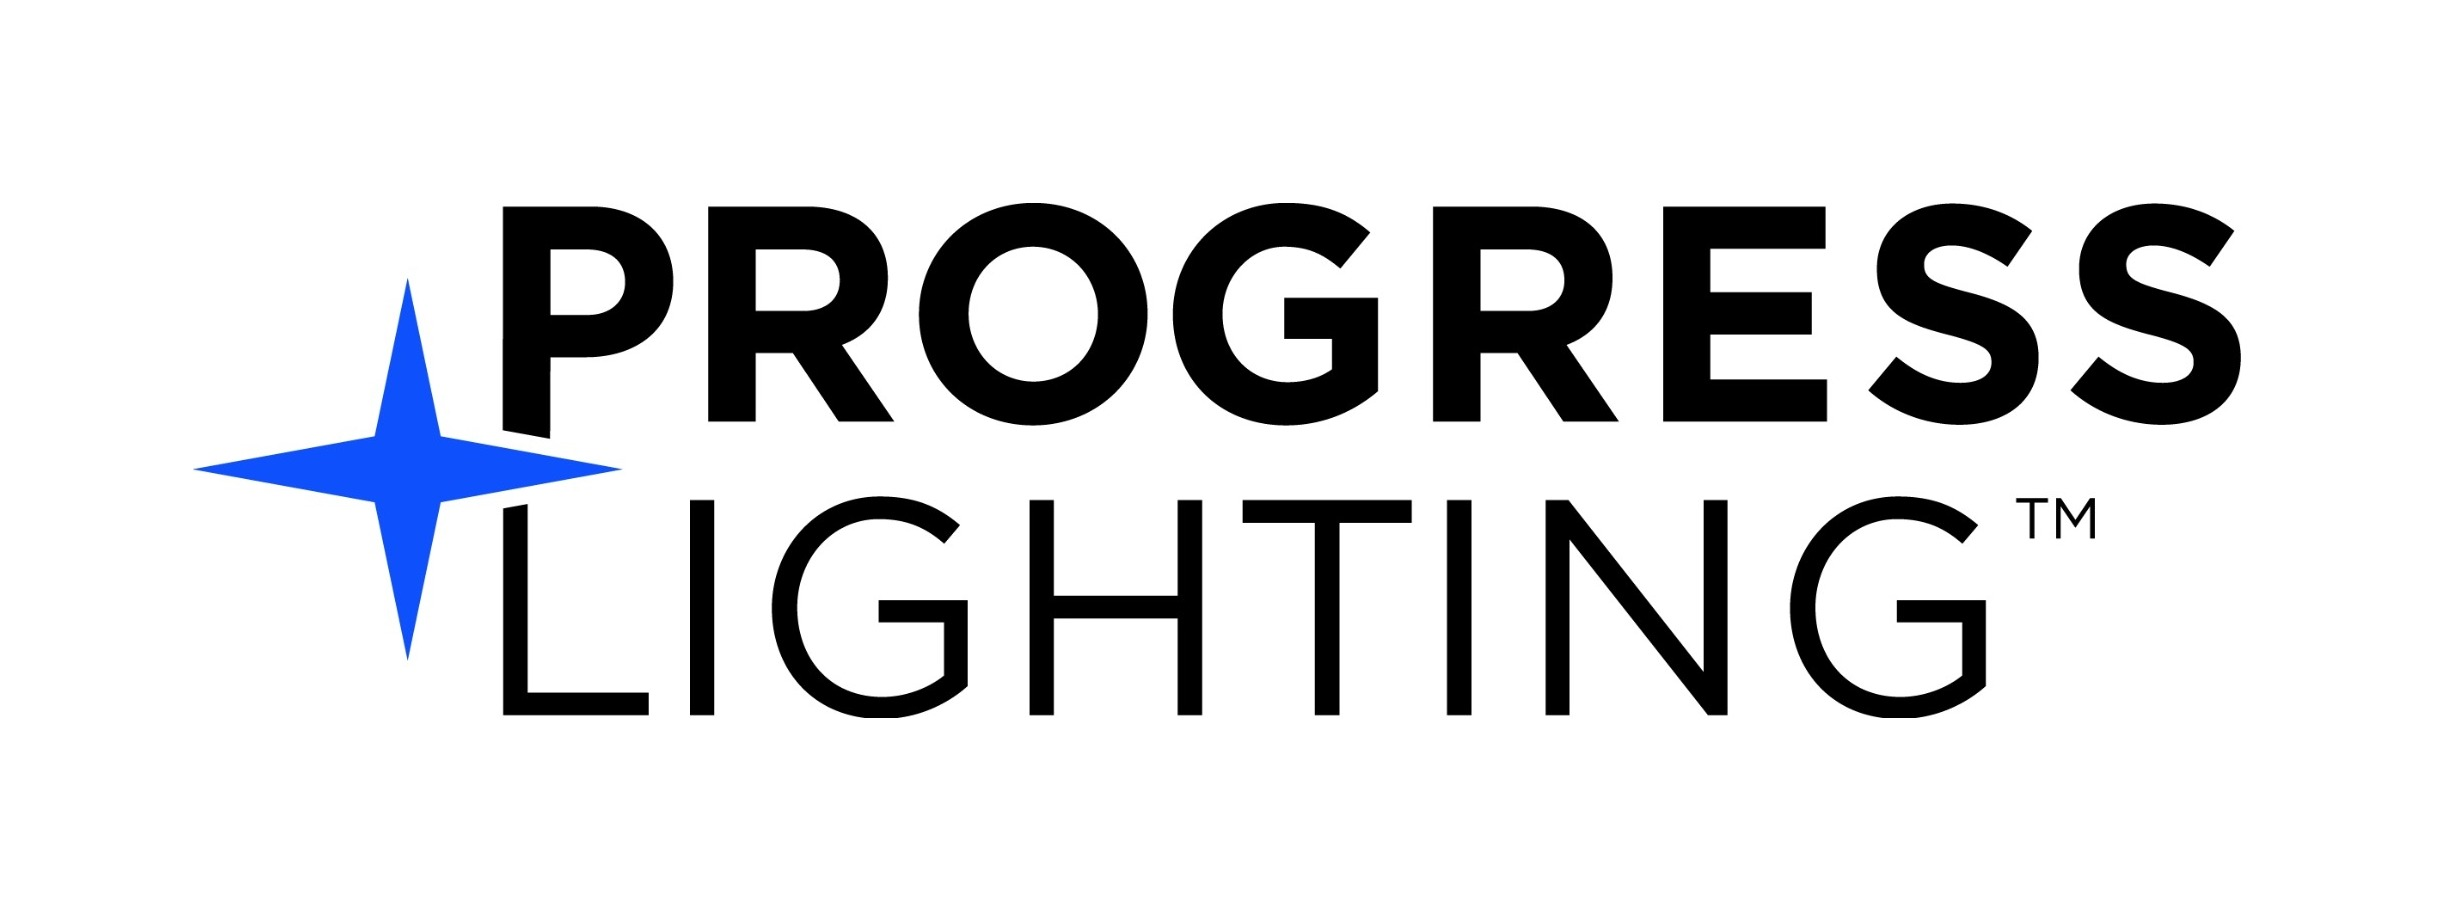 Progress Lighting Coupons & Promo codes